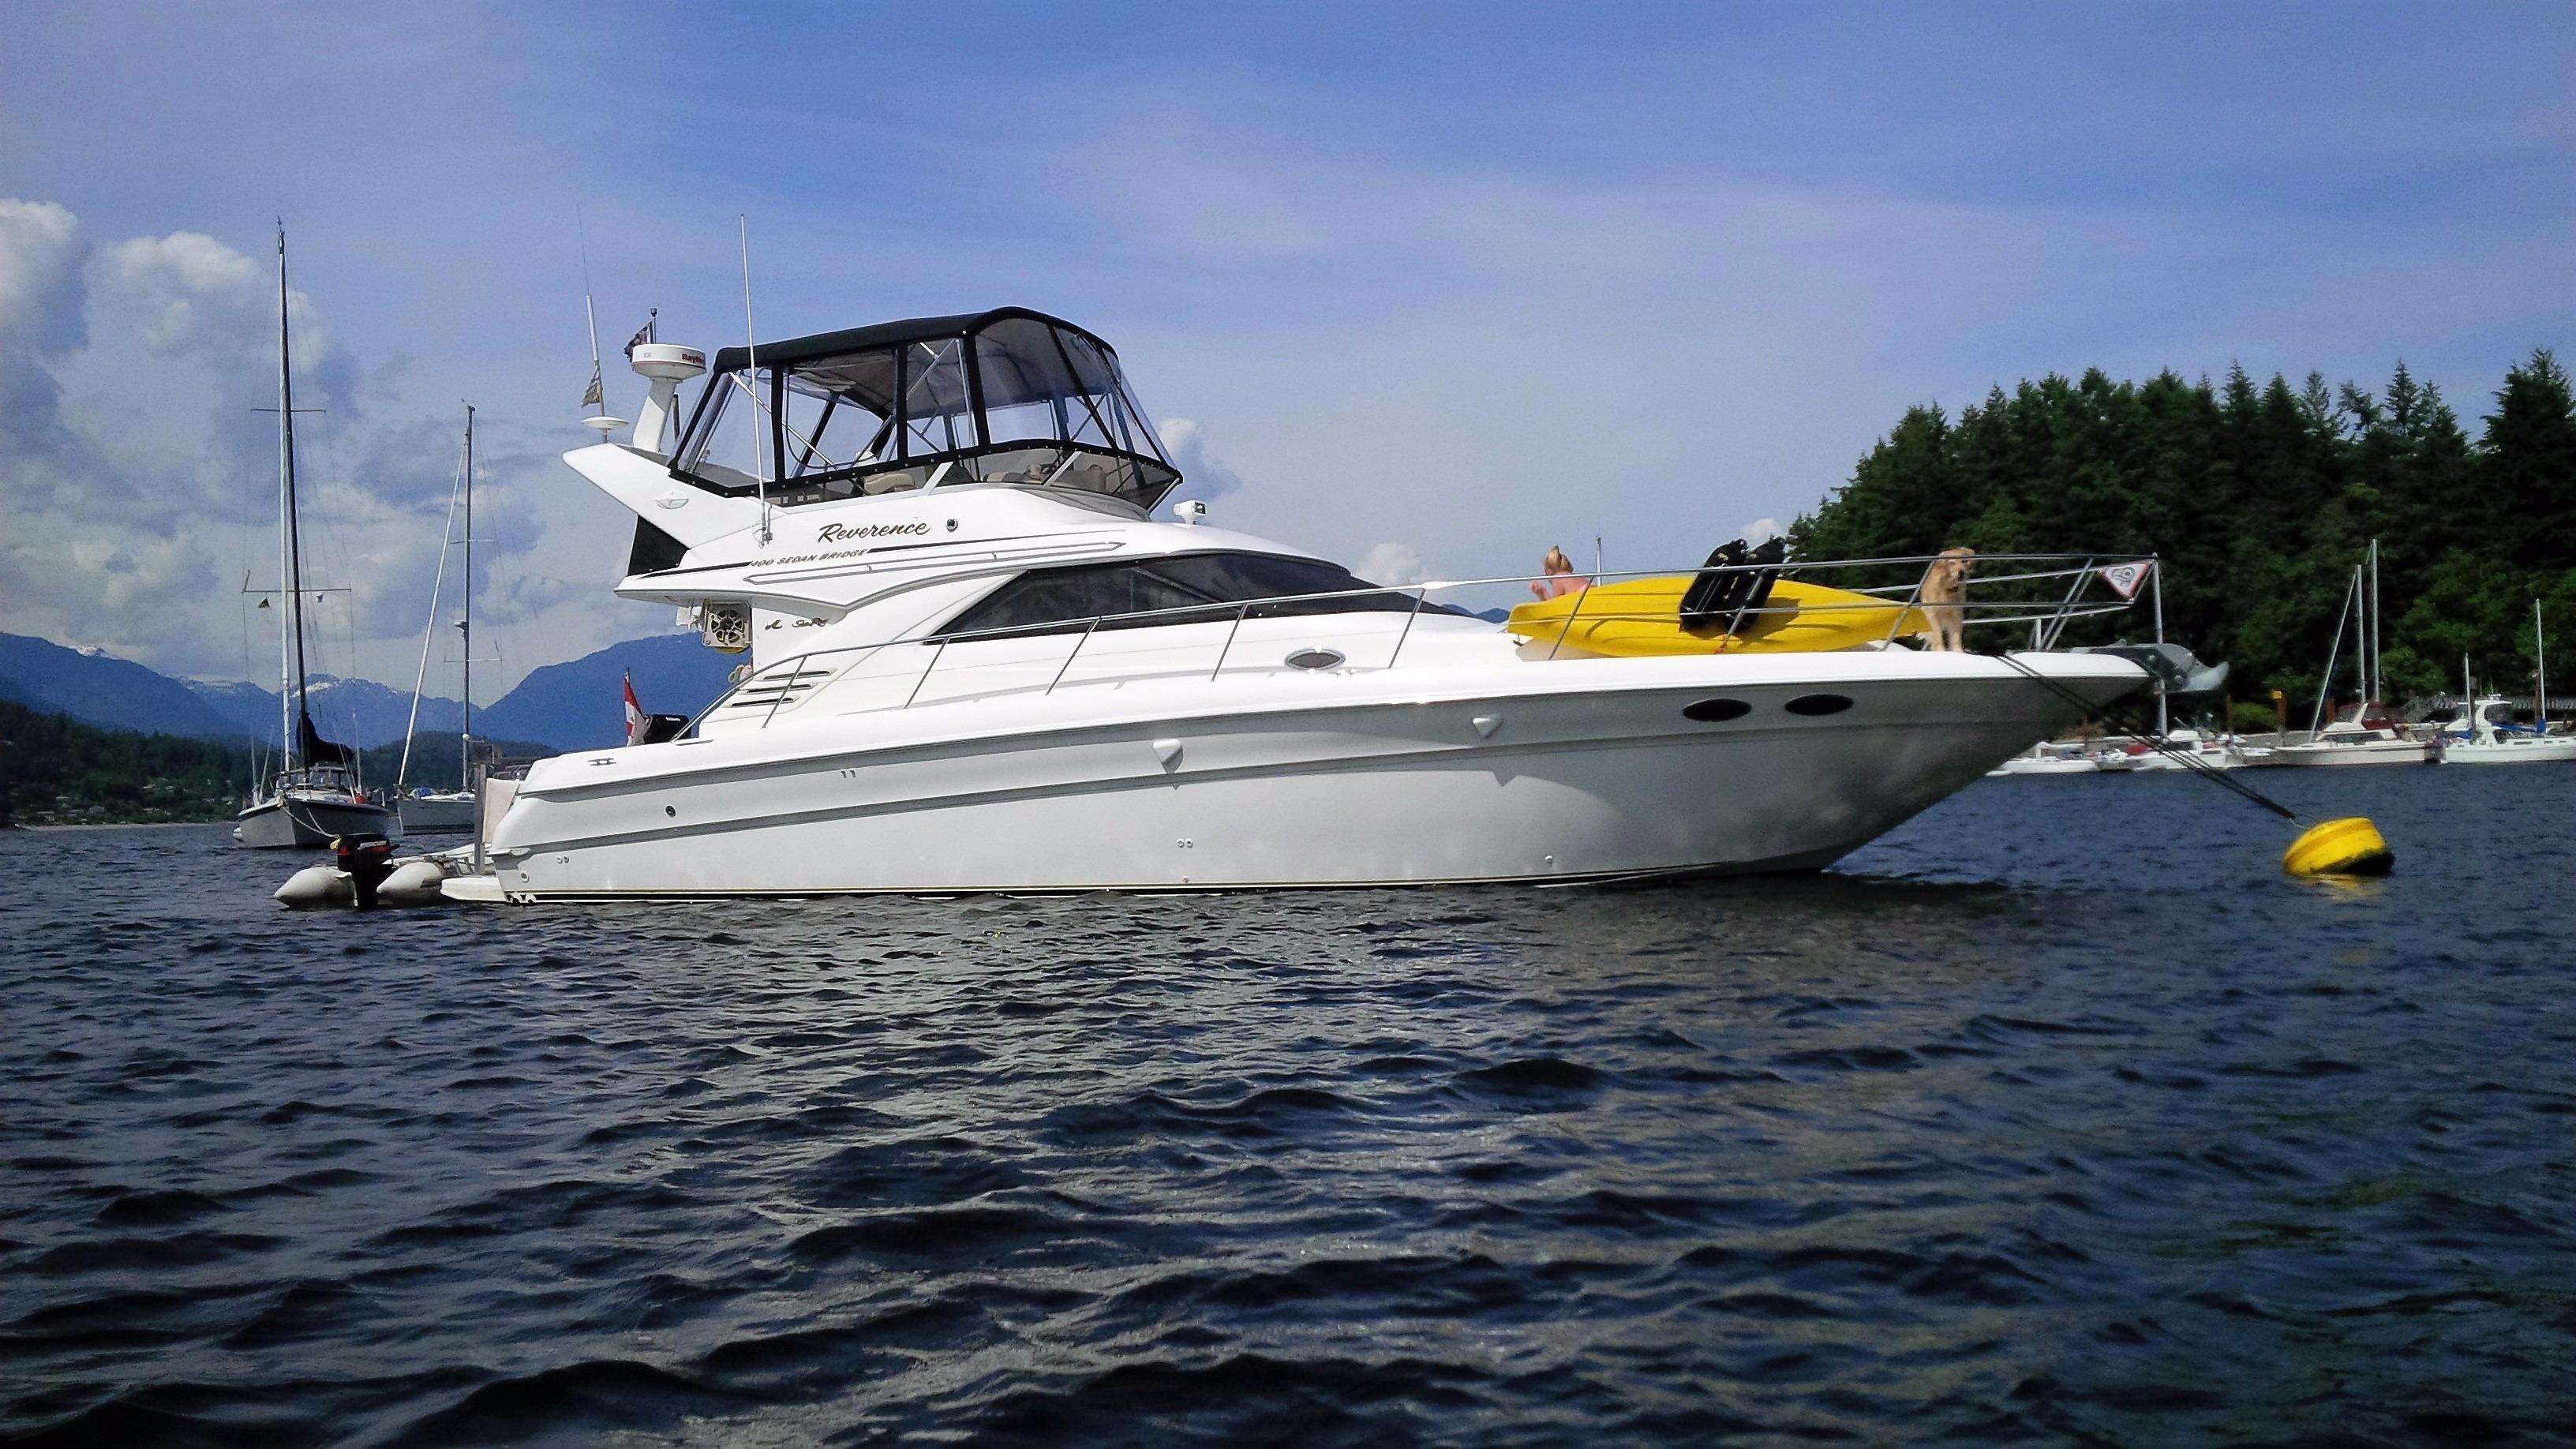 6163622_20170308085915225_1_XLARGE&w=924&h=693&t=1488992368000 1998 sea ray 400 sedan bridge power boat for sale www yachtworld com  at webbmarketing.co